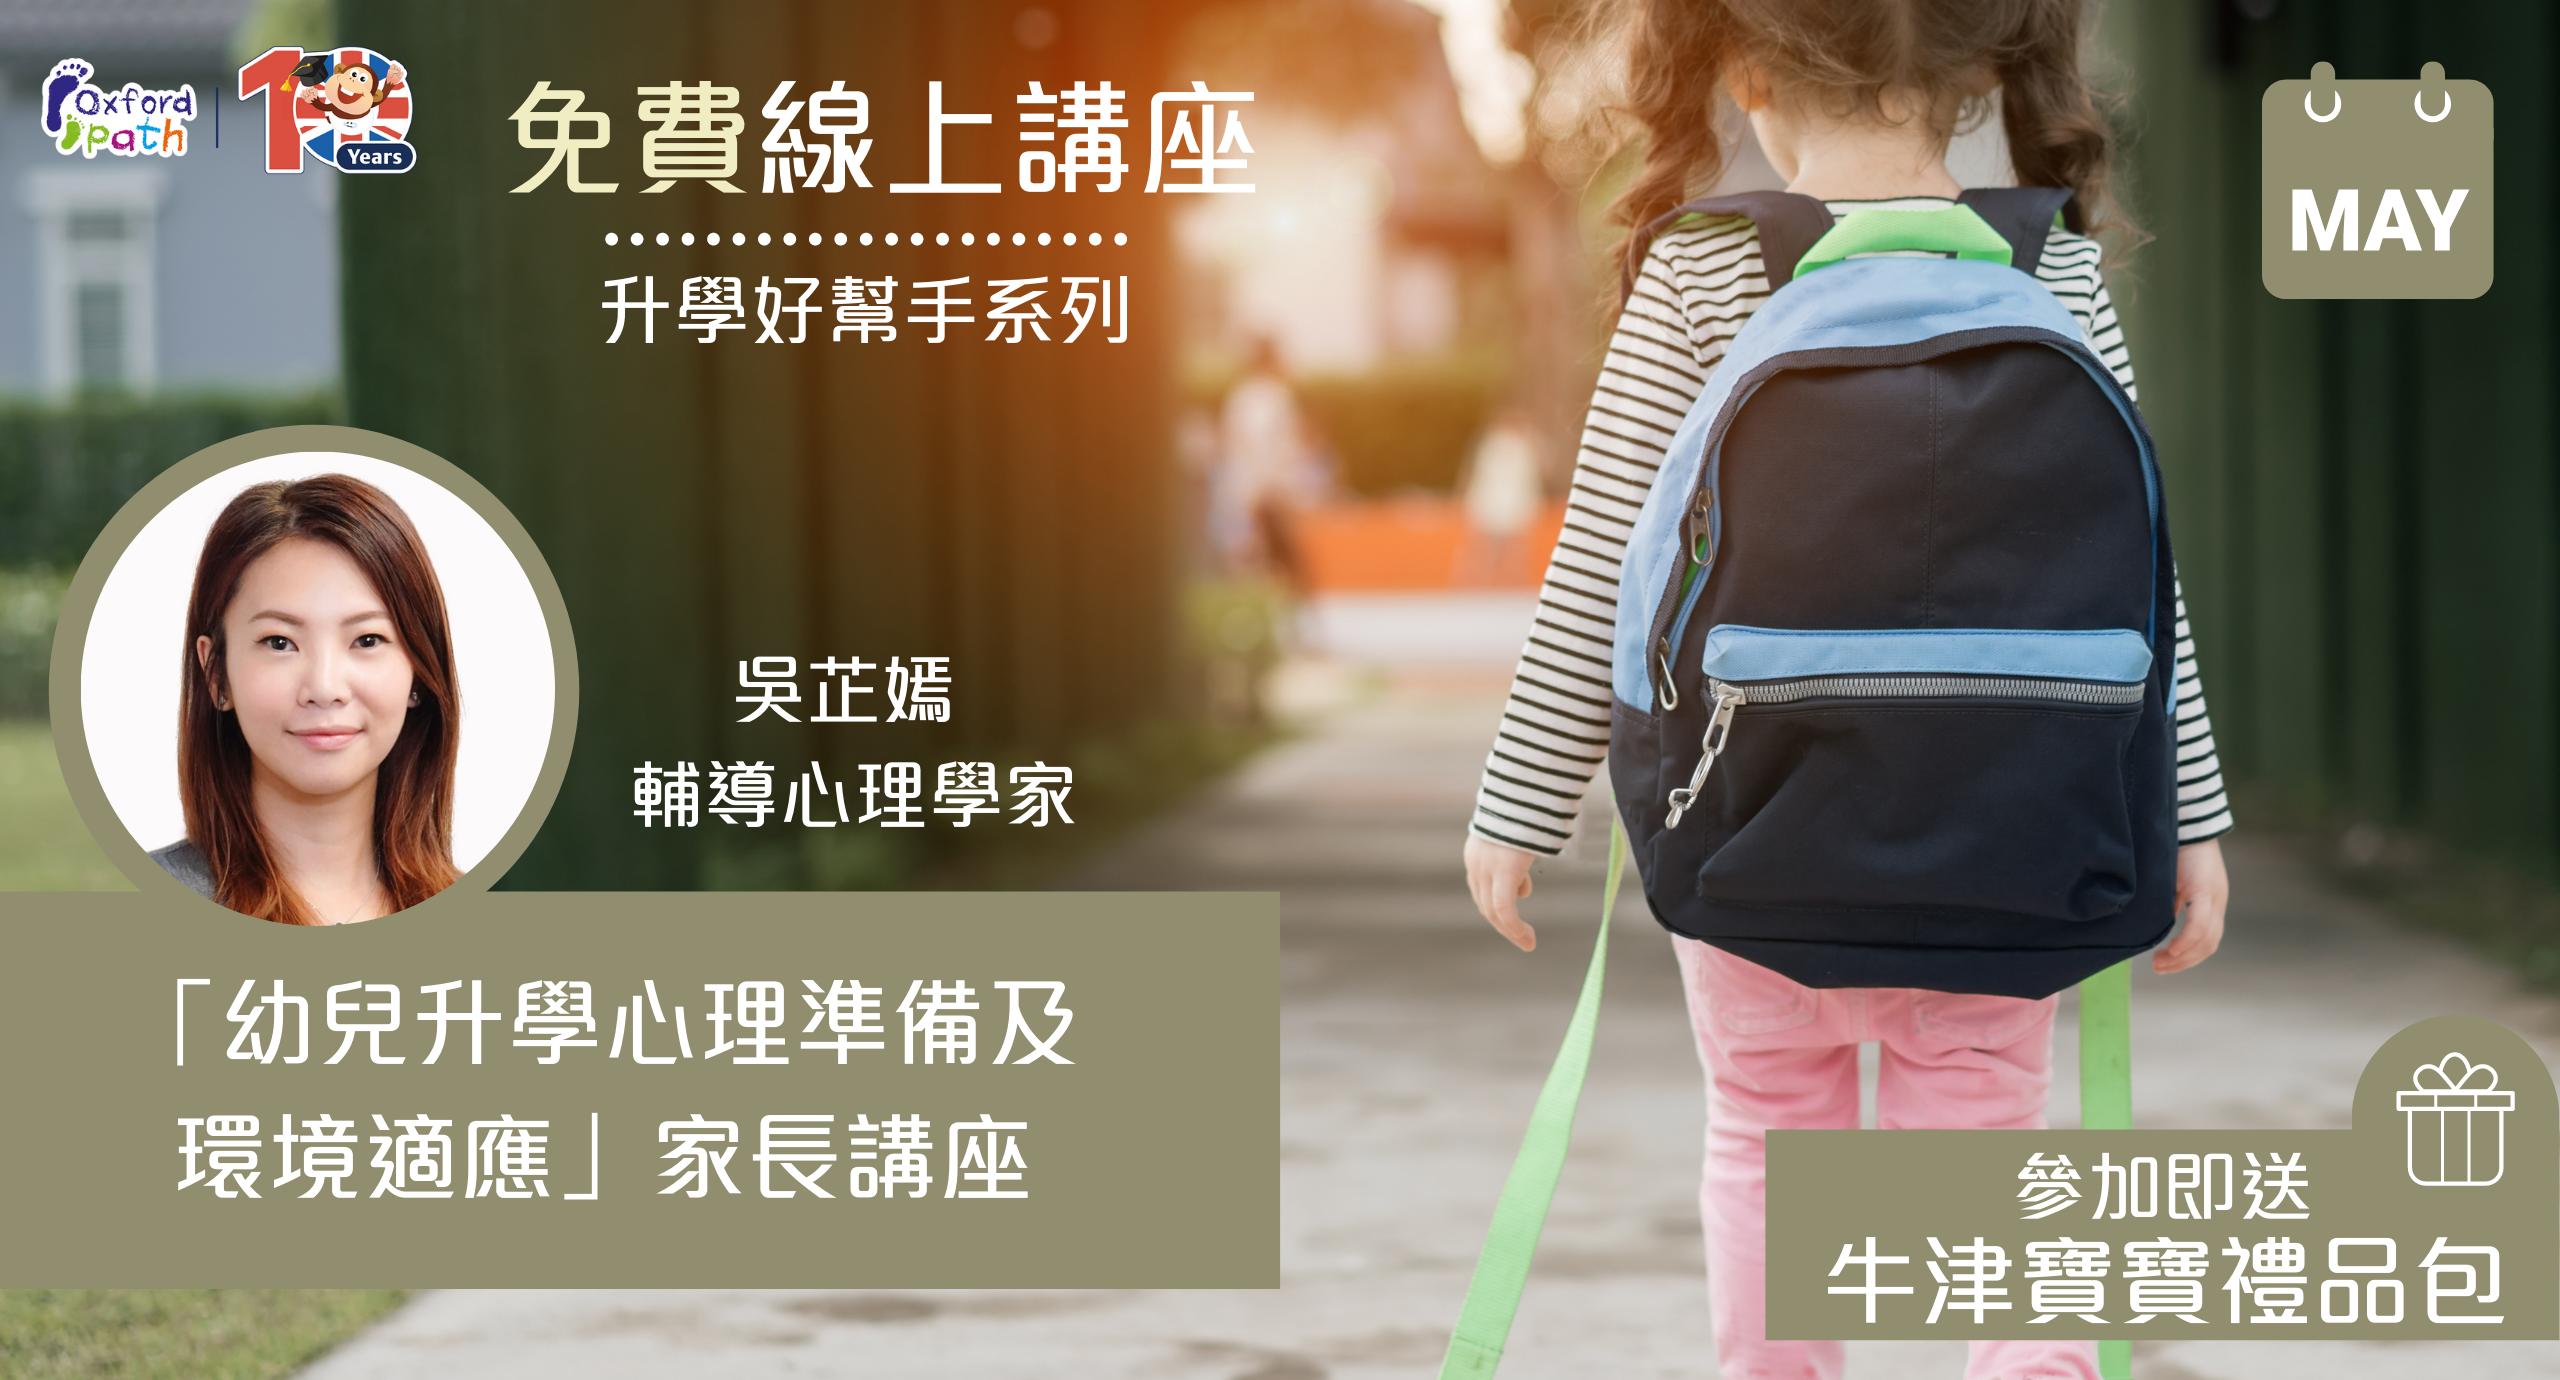 27 May 2021 Oxford Path「幼兒升學心理準備及環境適應」線上家長講座